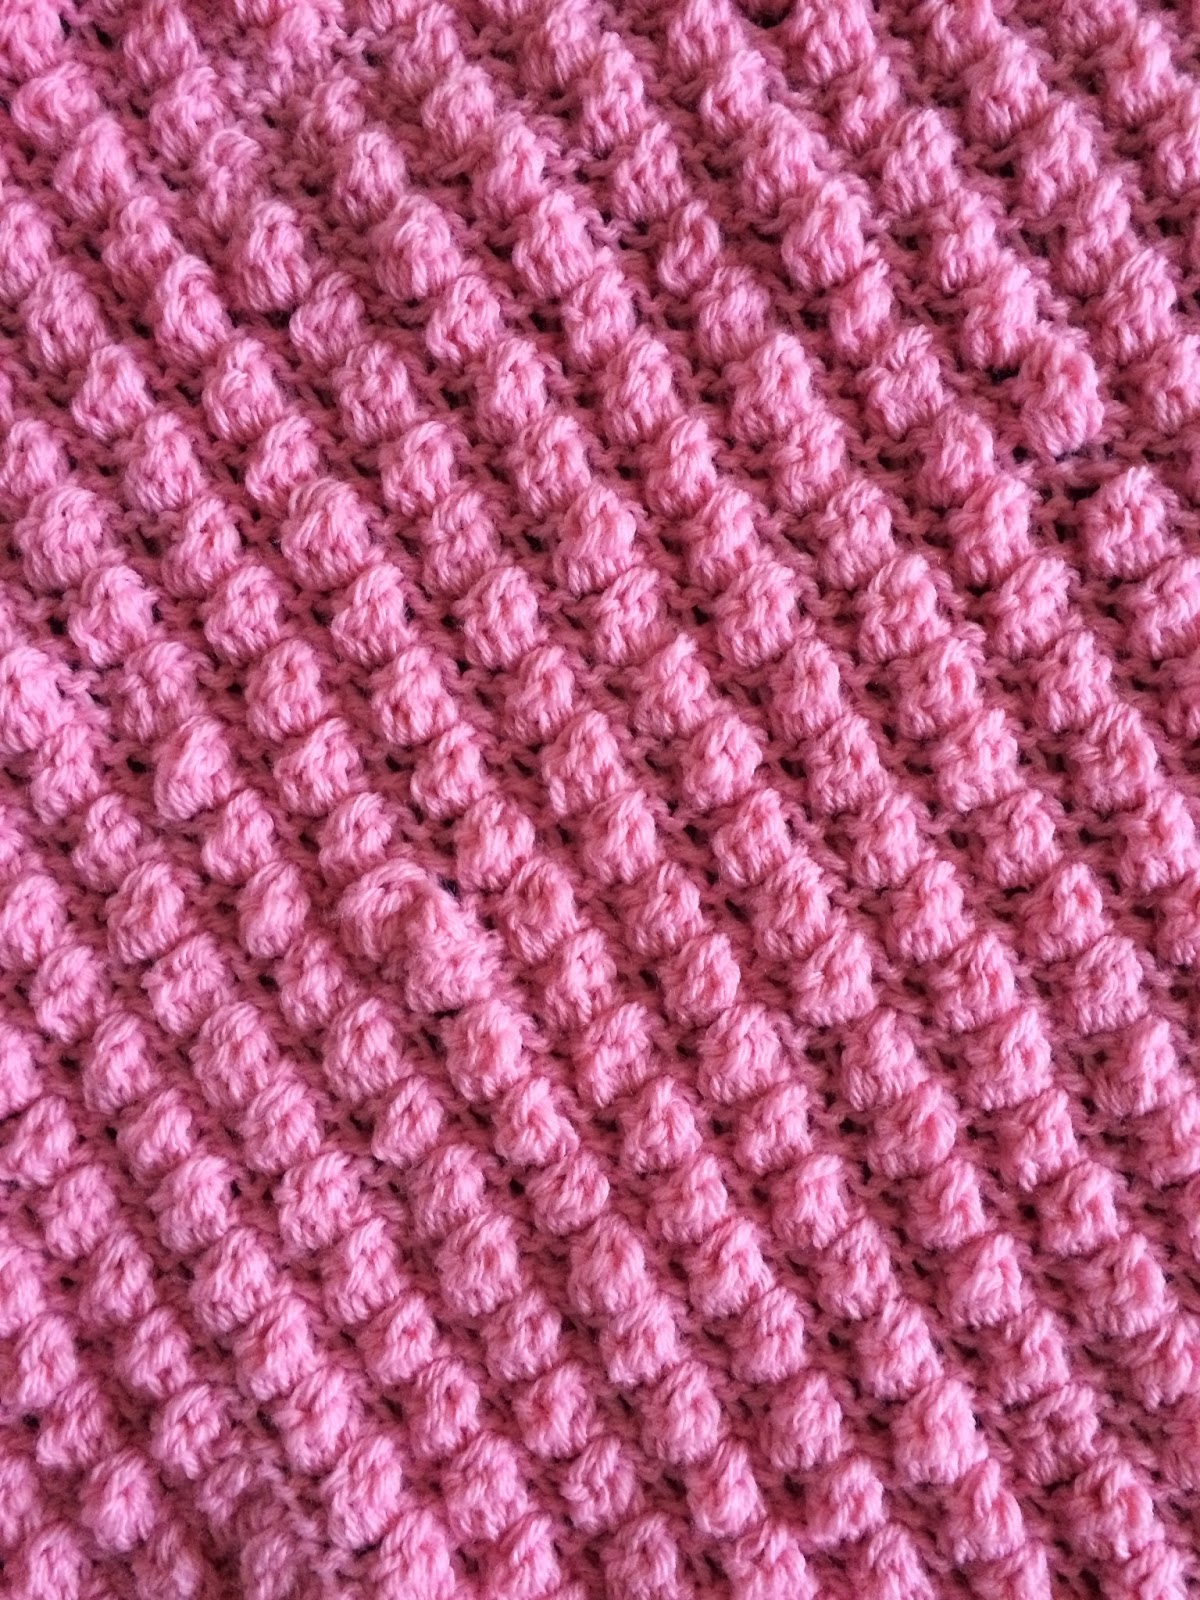 Tunisian crochet puff stitch baby blanket free pattern not my tunisian crochet puff stitch baby blanket free pattern bankloansurffo Gallery